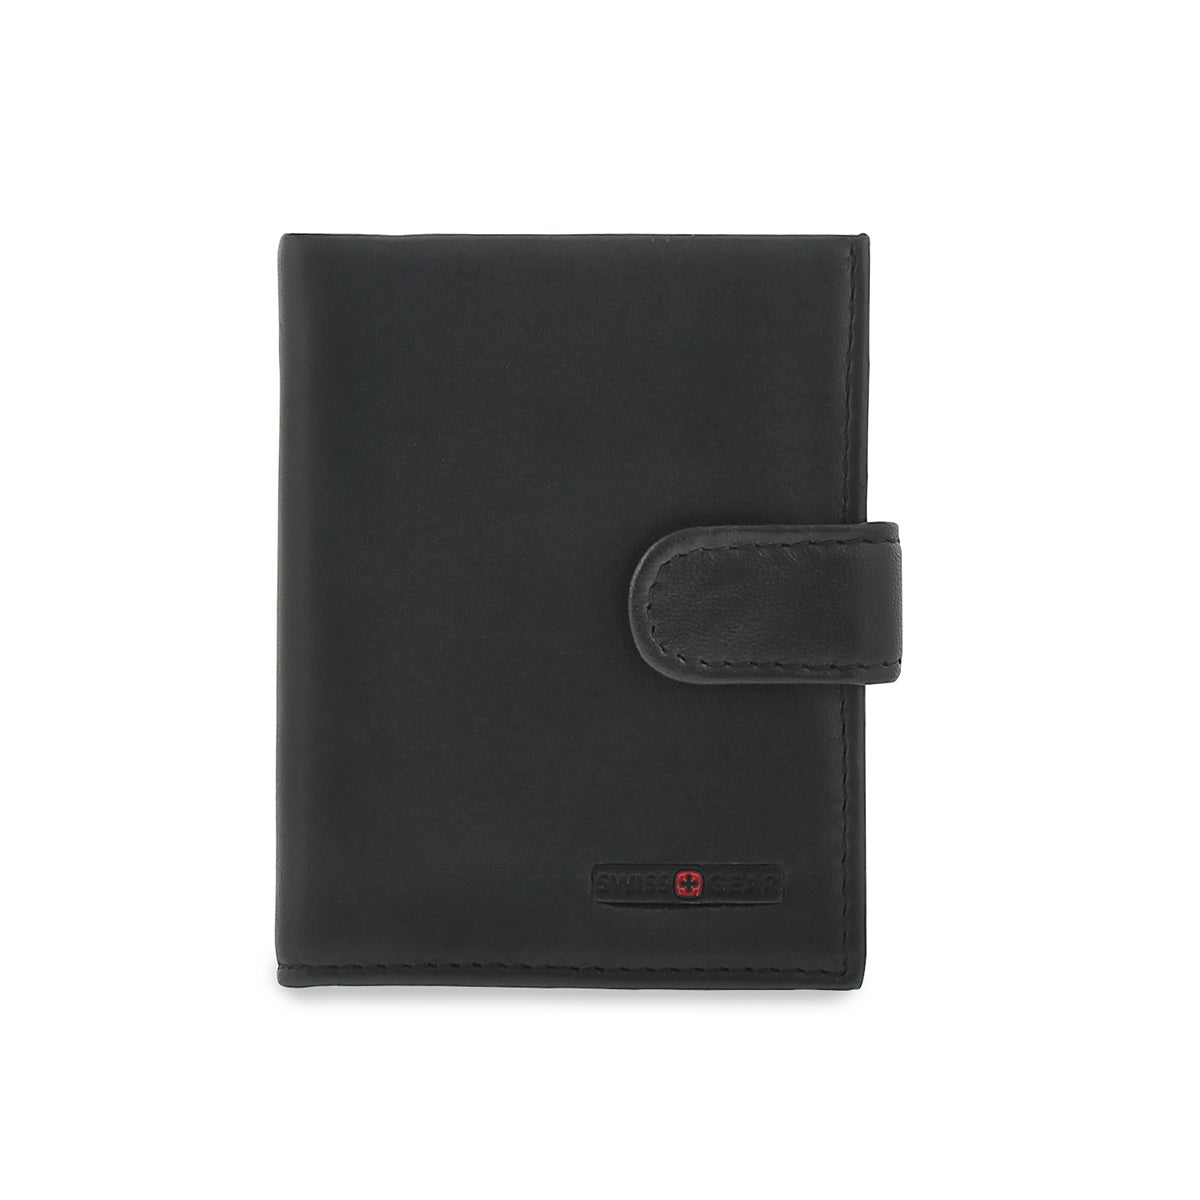 Porte-cartes � bouton-pression, noir, ho